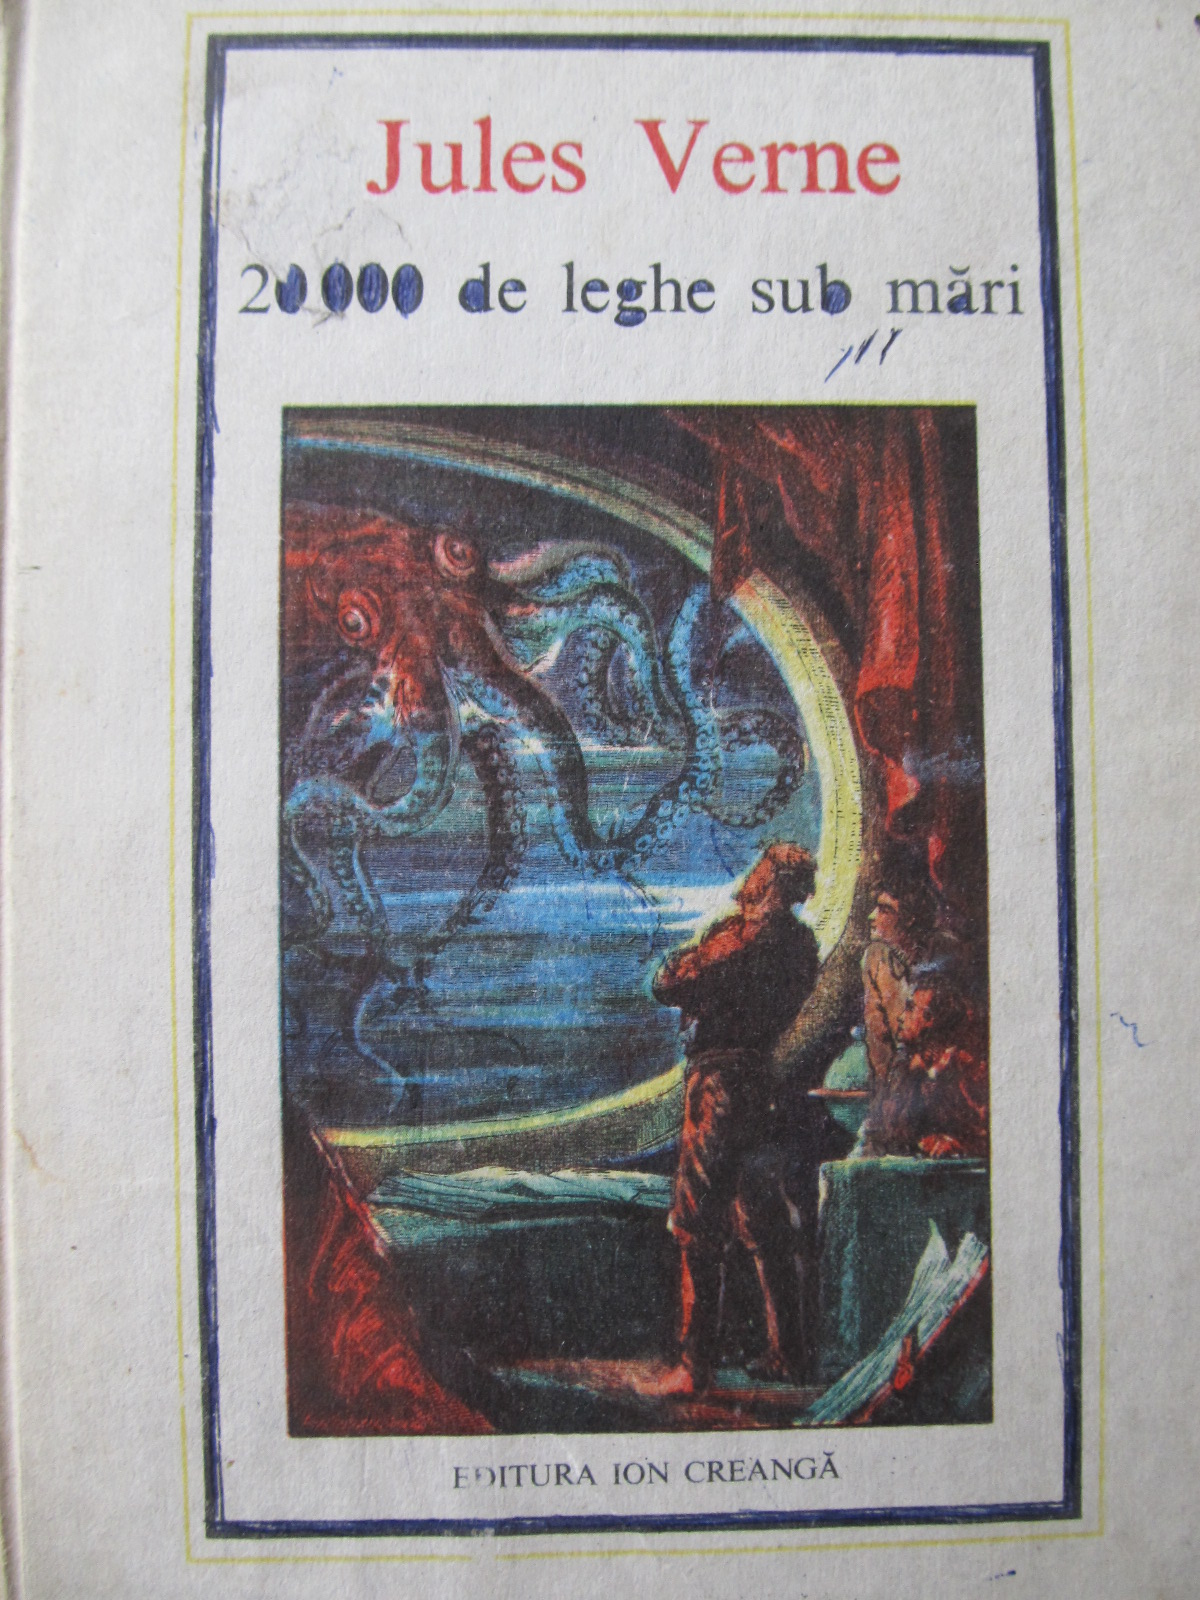 20000 de leghe sub mari (13) - Jules Verne | Detalii carte